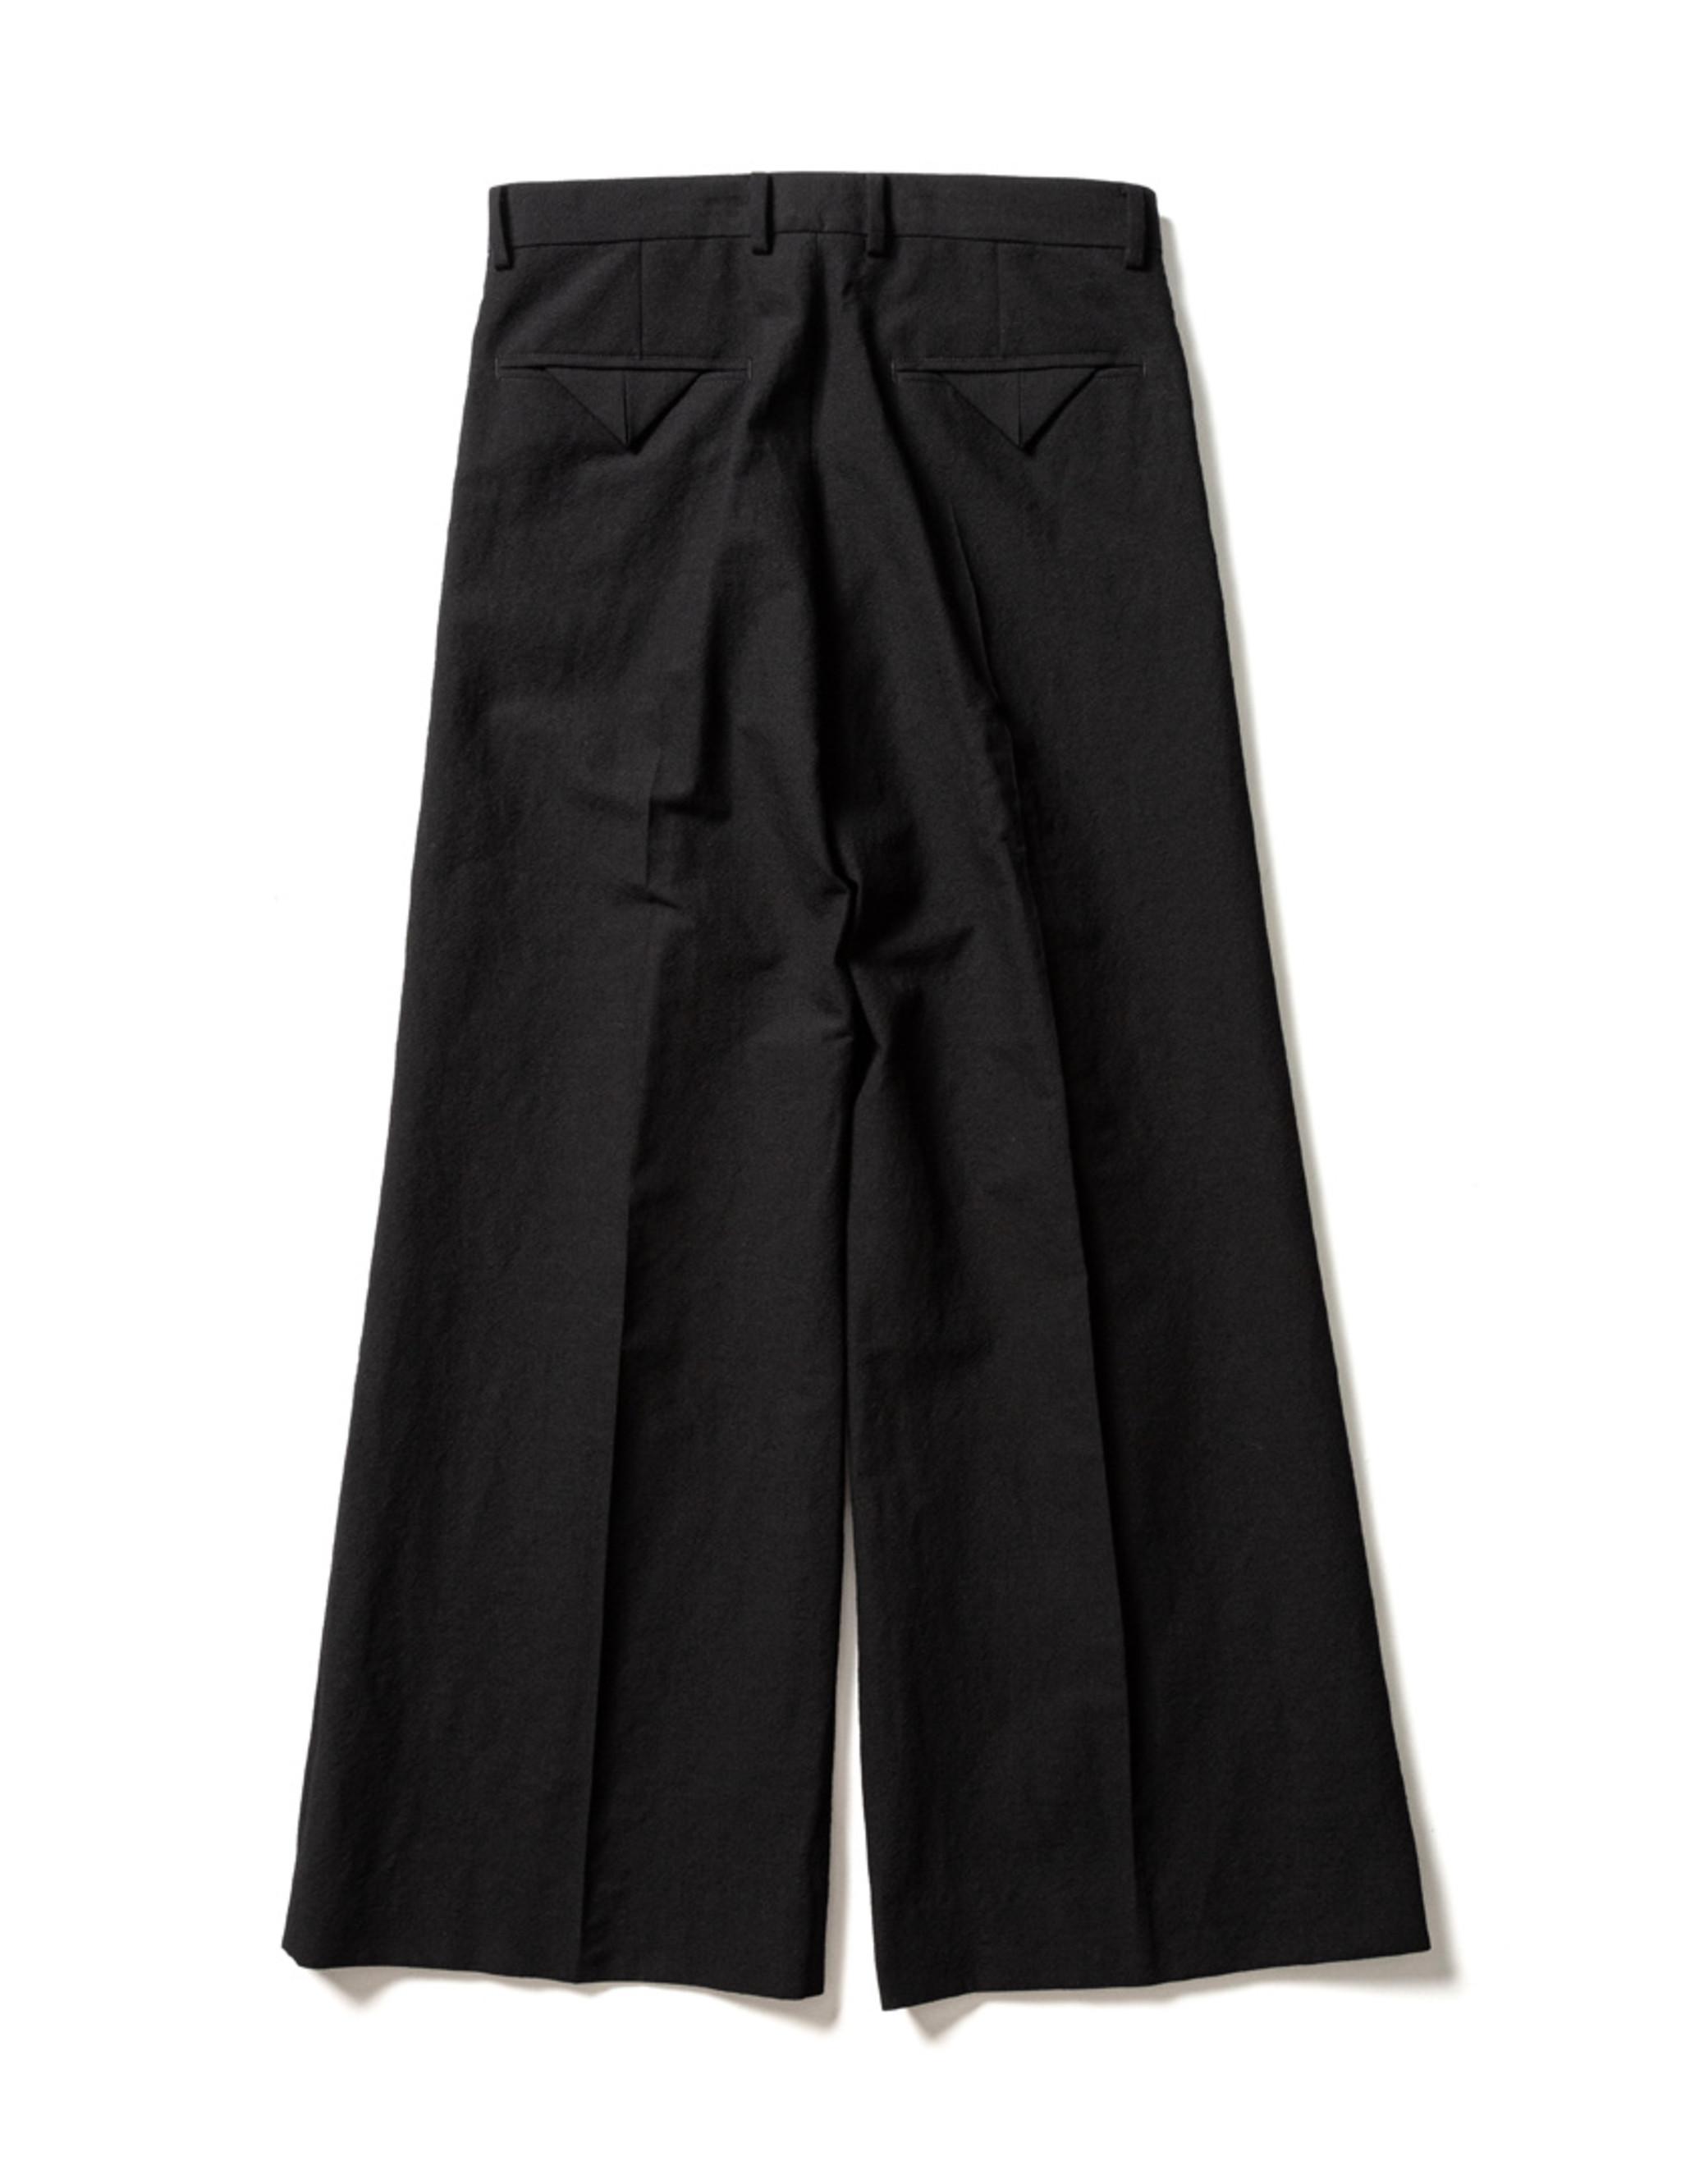 Sasquatchfabrix. FLARE SILHOUETTE SLACKS - Black